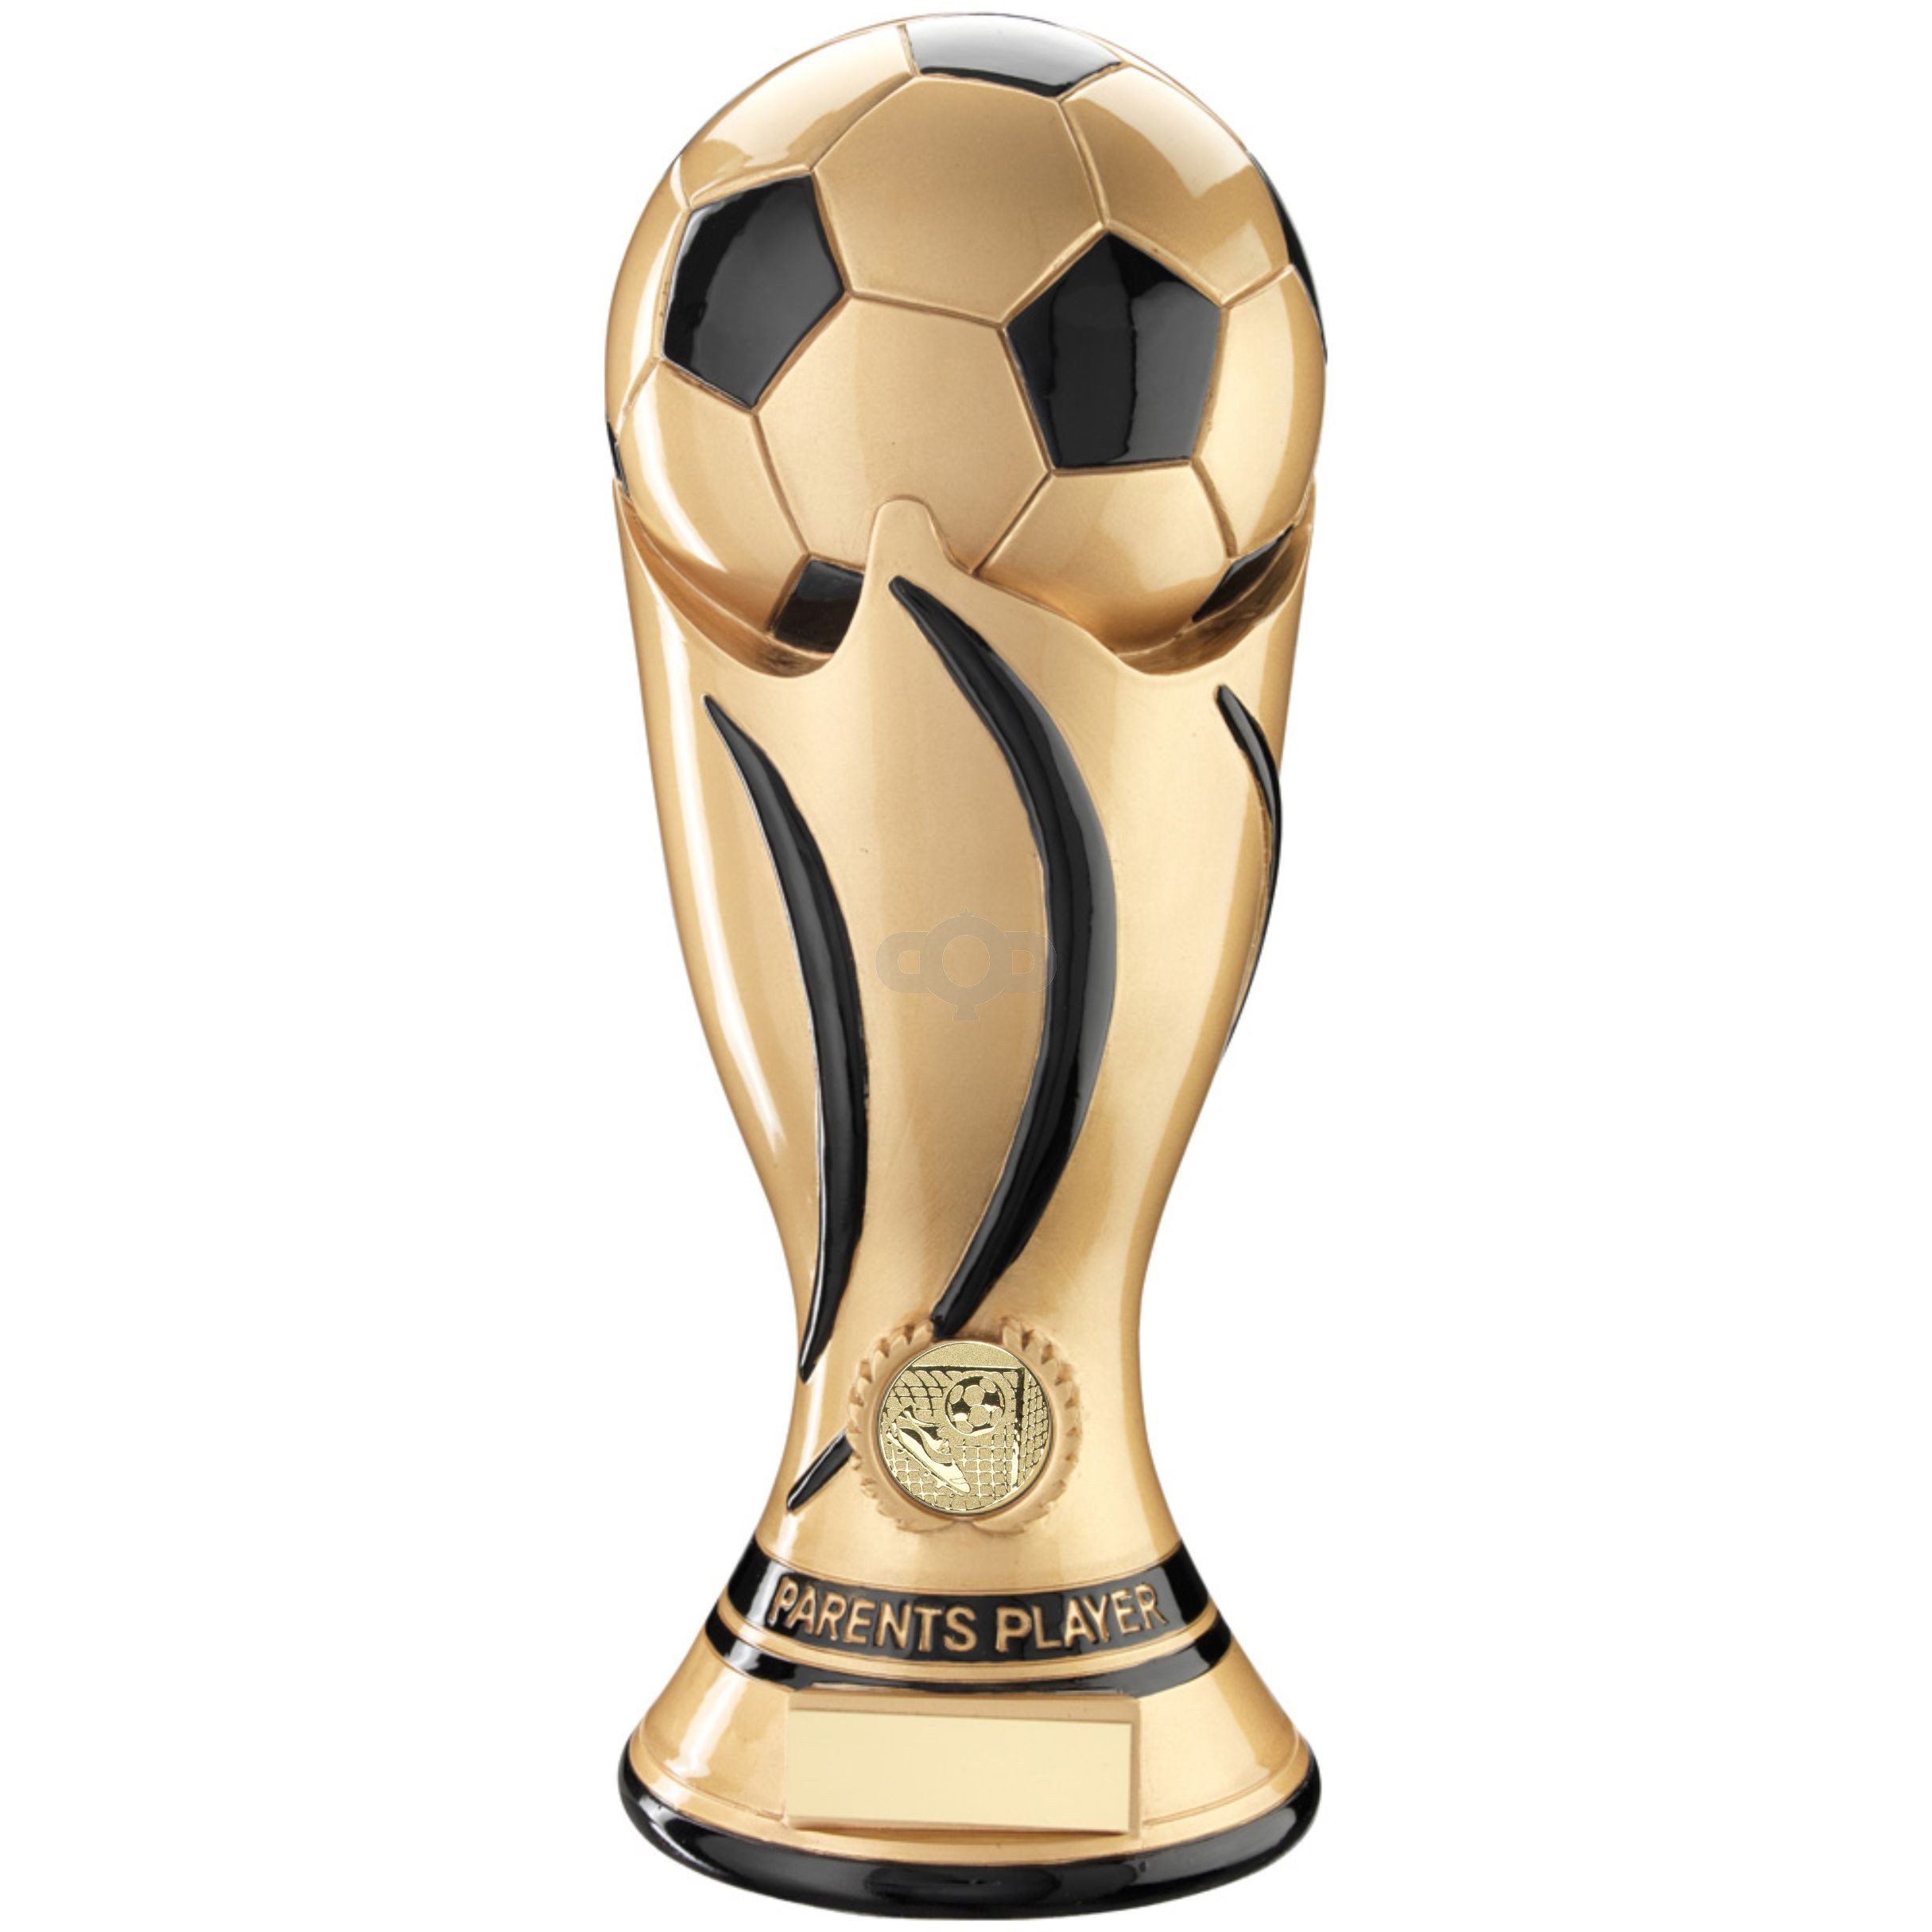 Gold & Black Football Swirl Column Trophy  - Parents Player